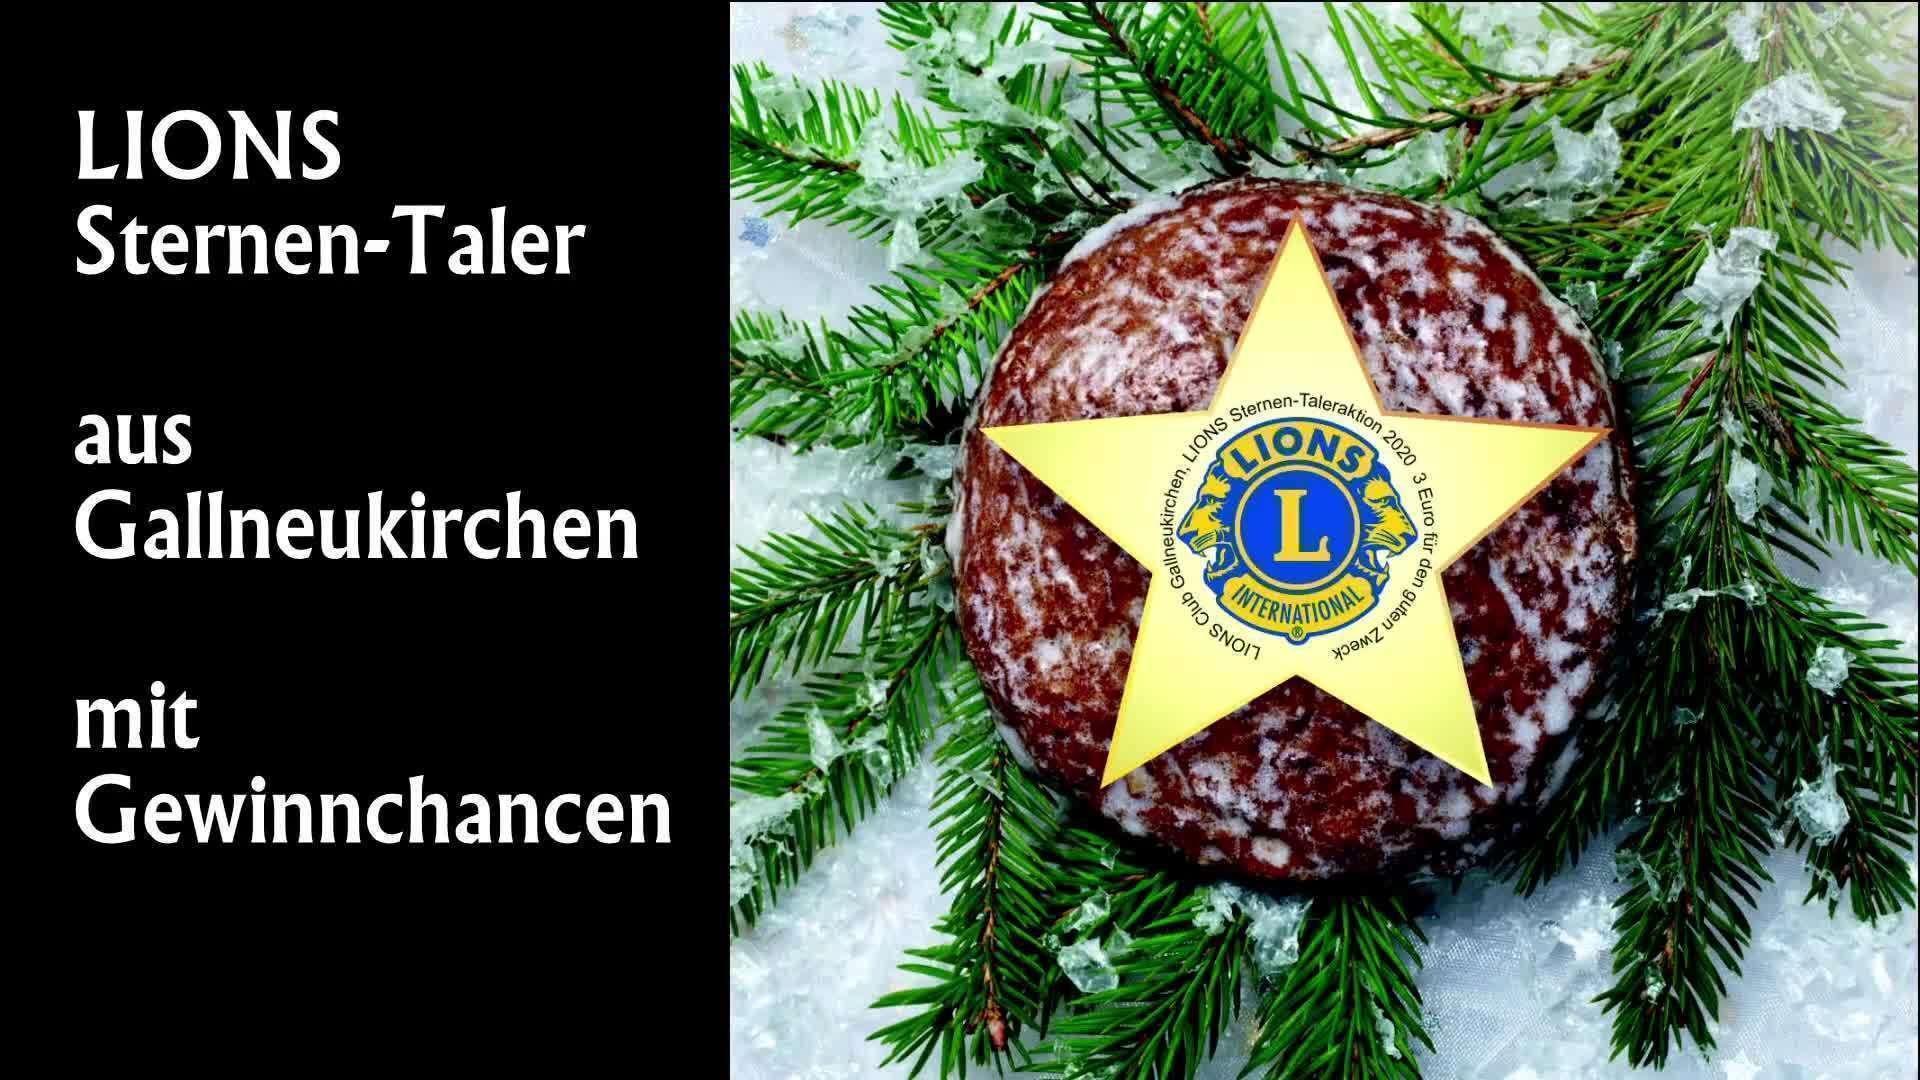 LIONS Sternen-Taler in Gallneukirchen